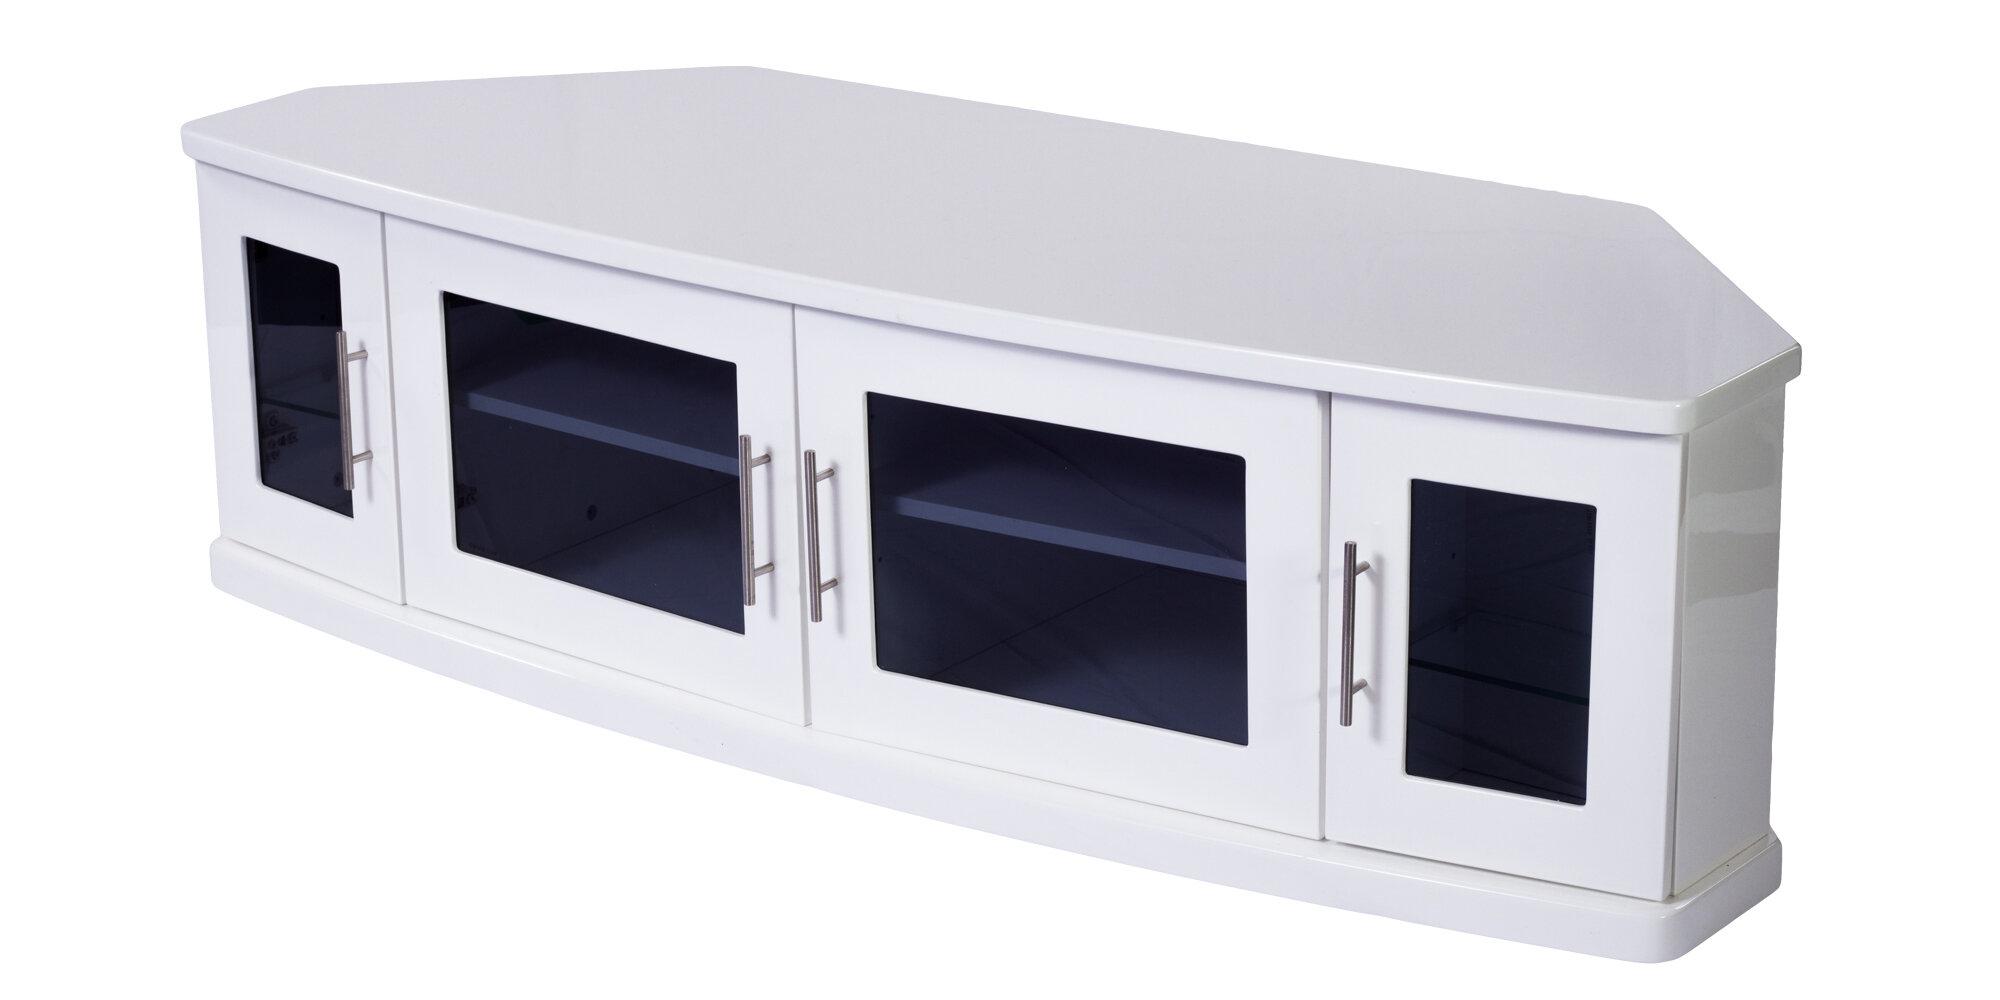 plateau newport corner tv stand ebay. Black Bedroom Furniture Sets. Home Design Ideas